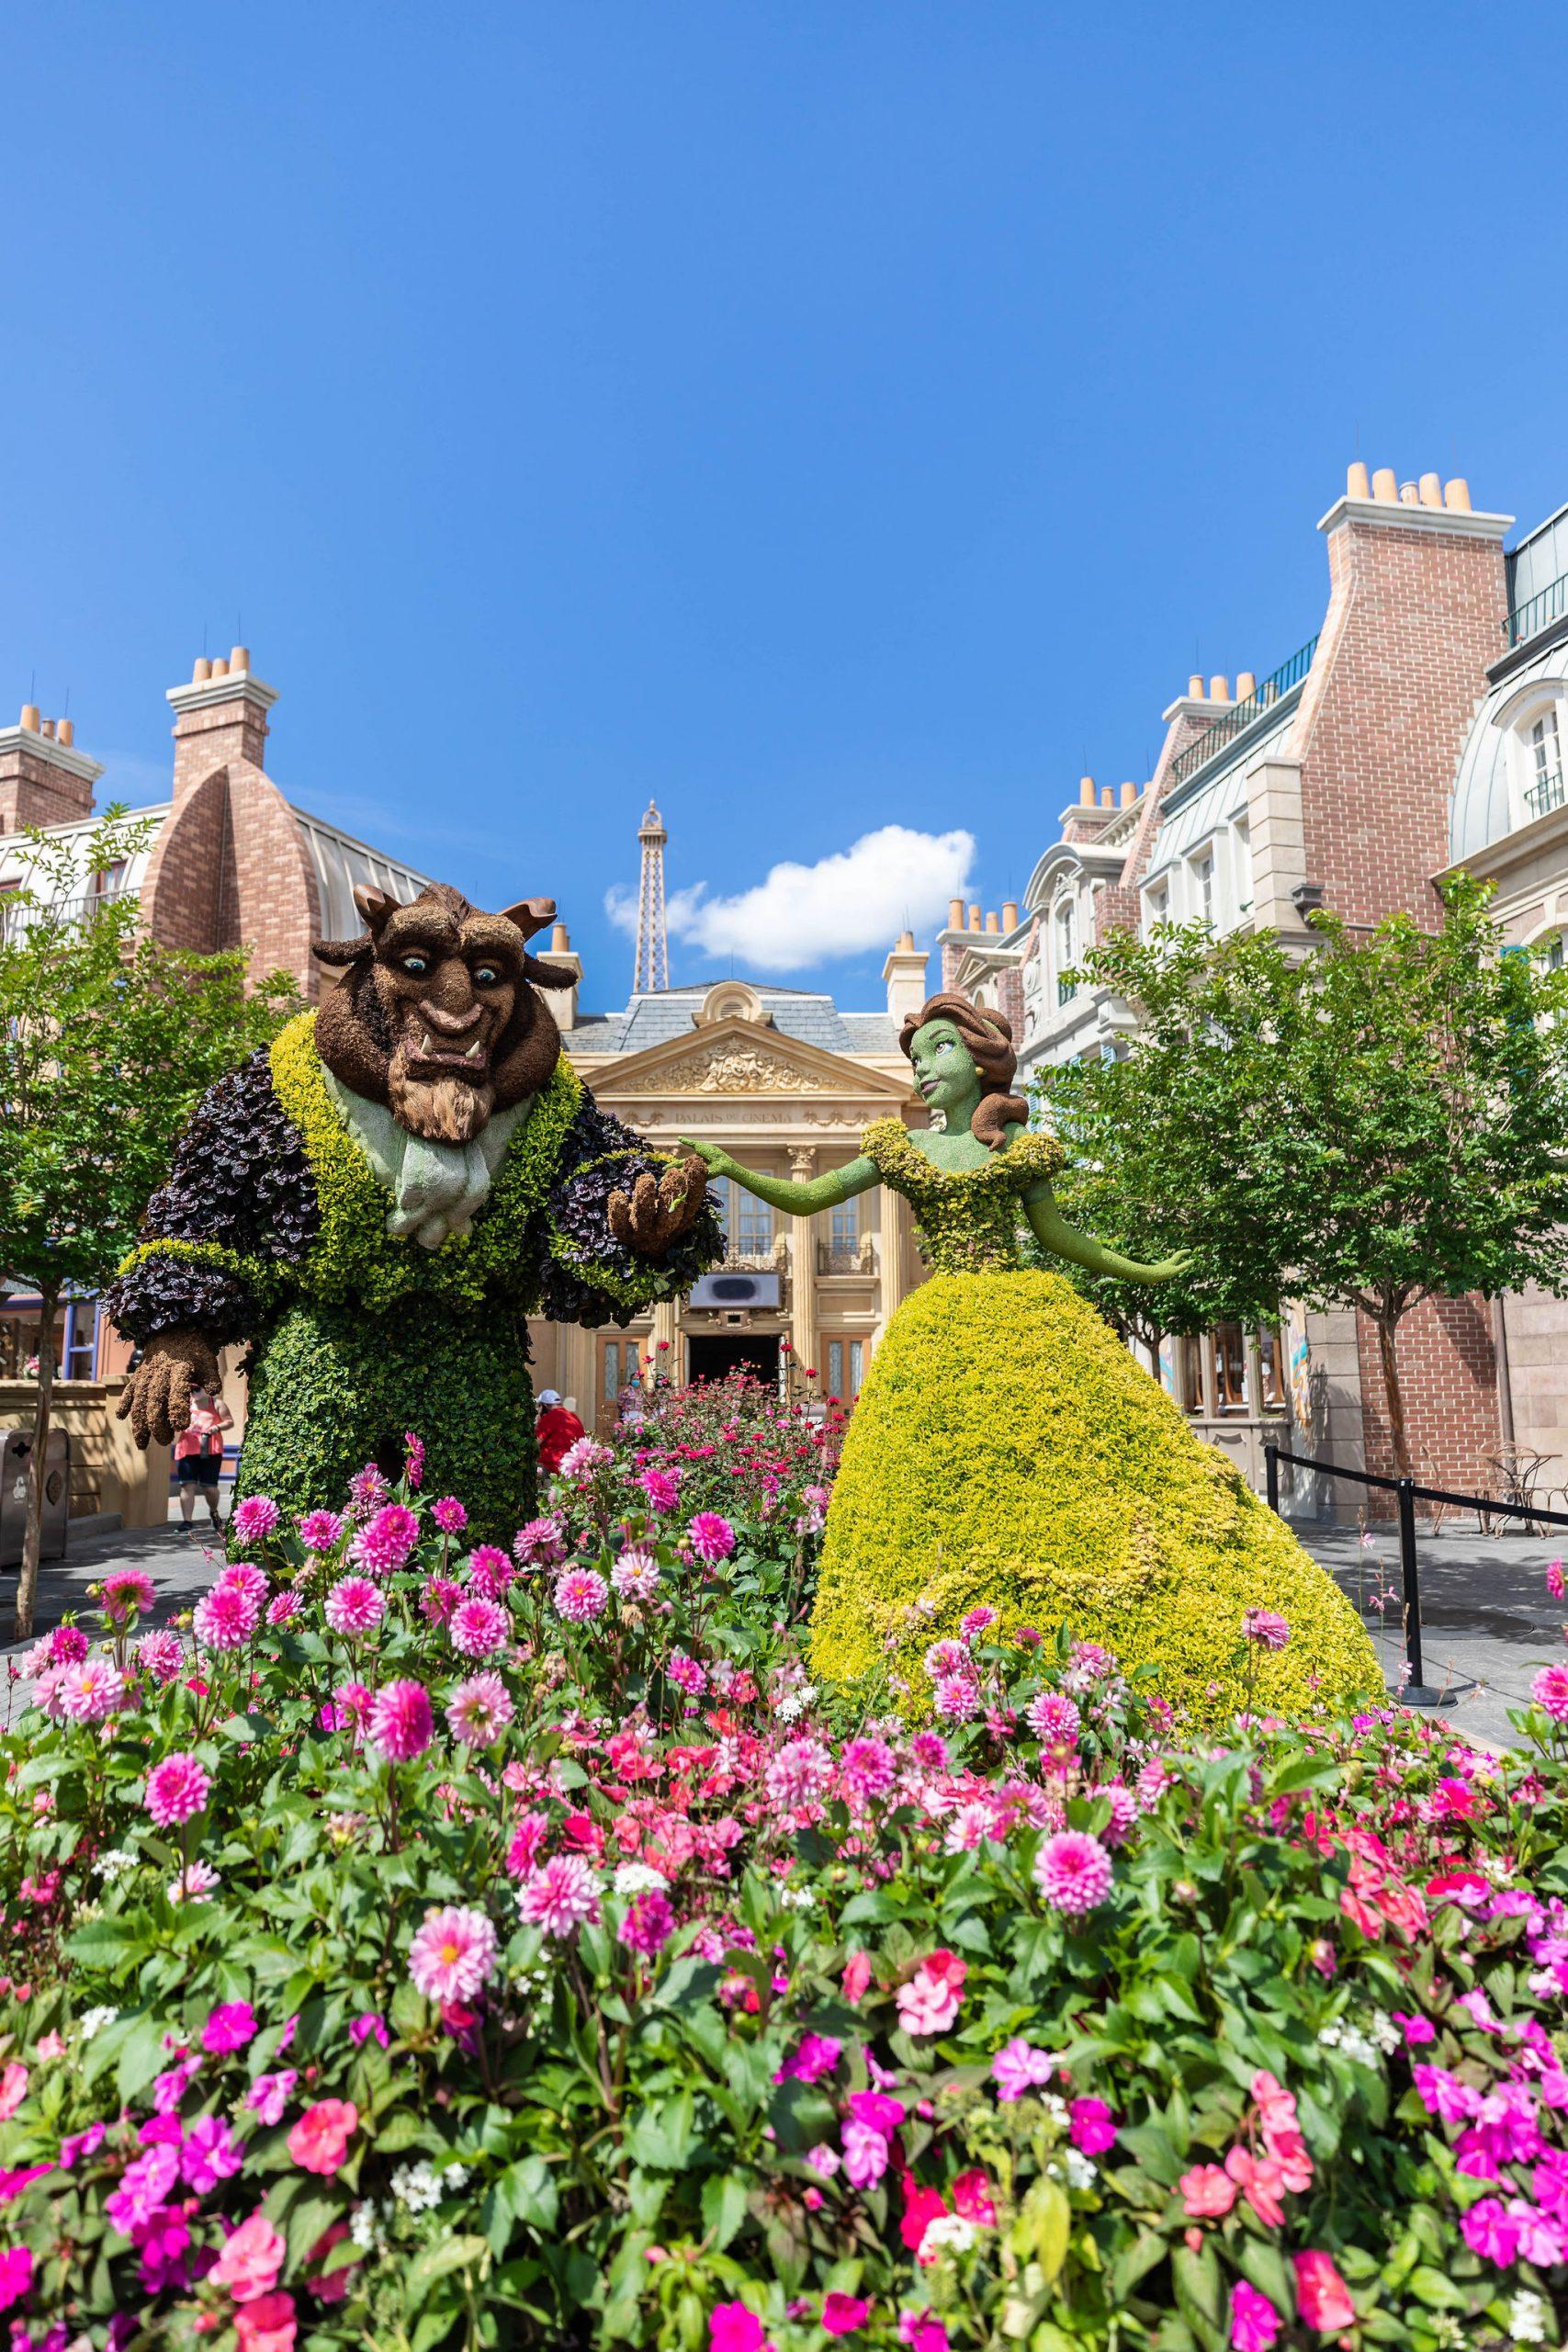 Epcot Flower & Garden Festival Walt Disney World Beauty & the Beast Topiary Photographed by Luxury Travel Writer Annie Fairfax